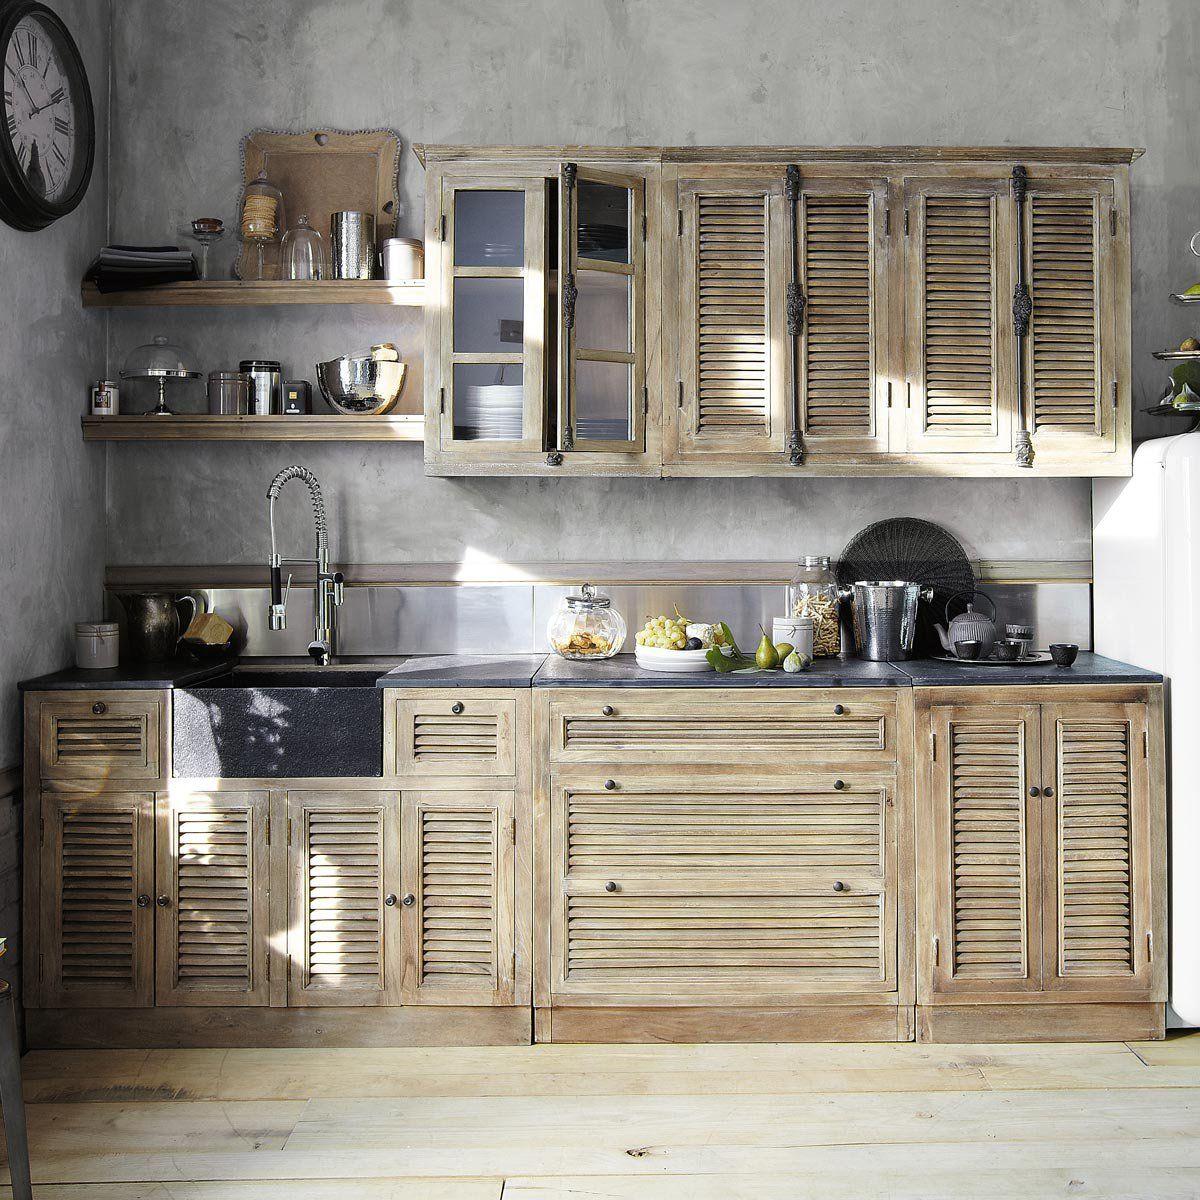 new kitchen designs from maisons du monde kitchens kitchen design and loft kitchen. Black Bedroom Furniture Sets. Home Design Ideas